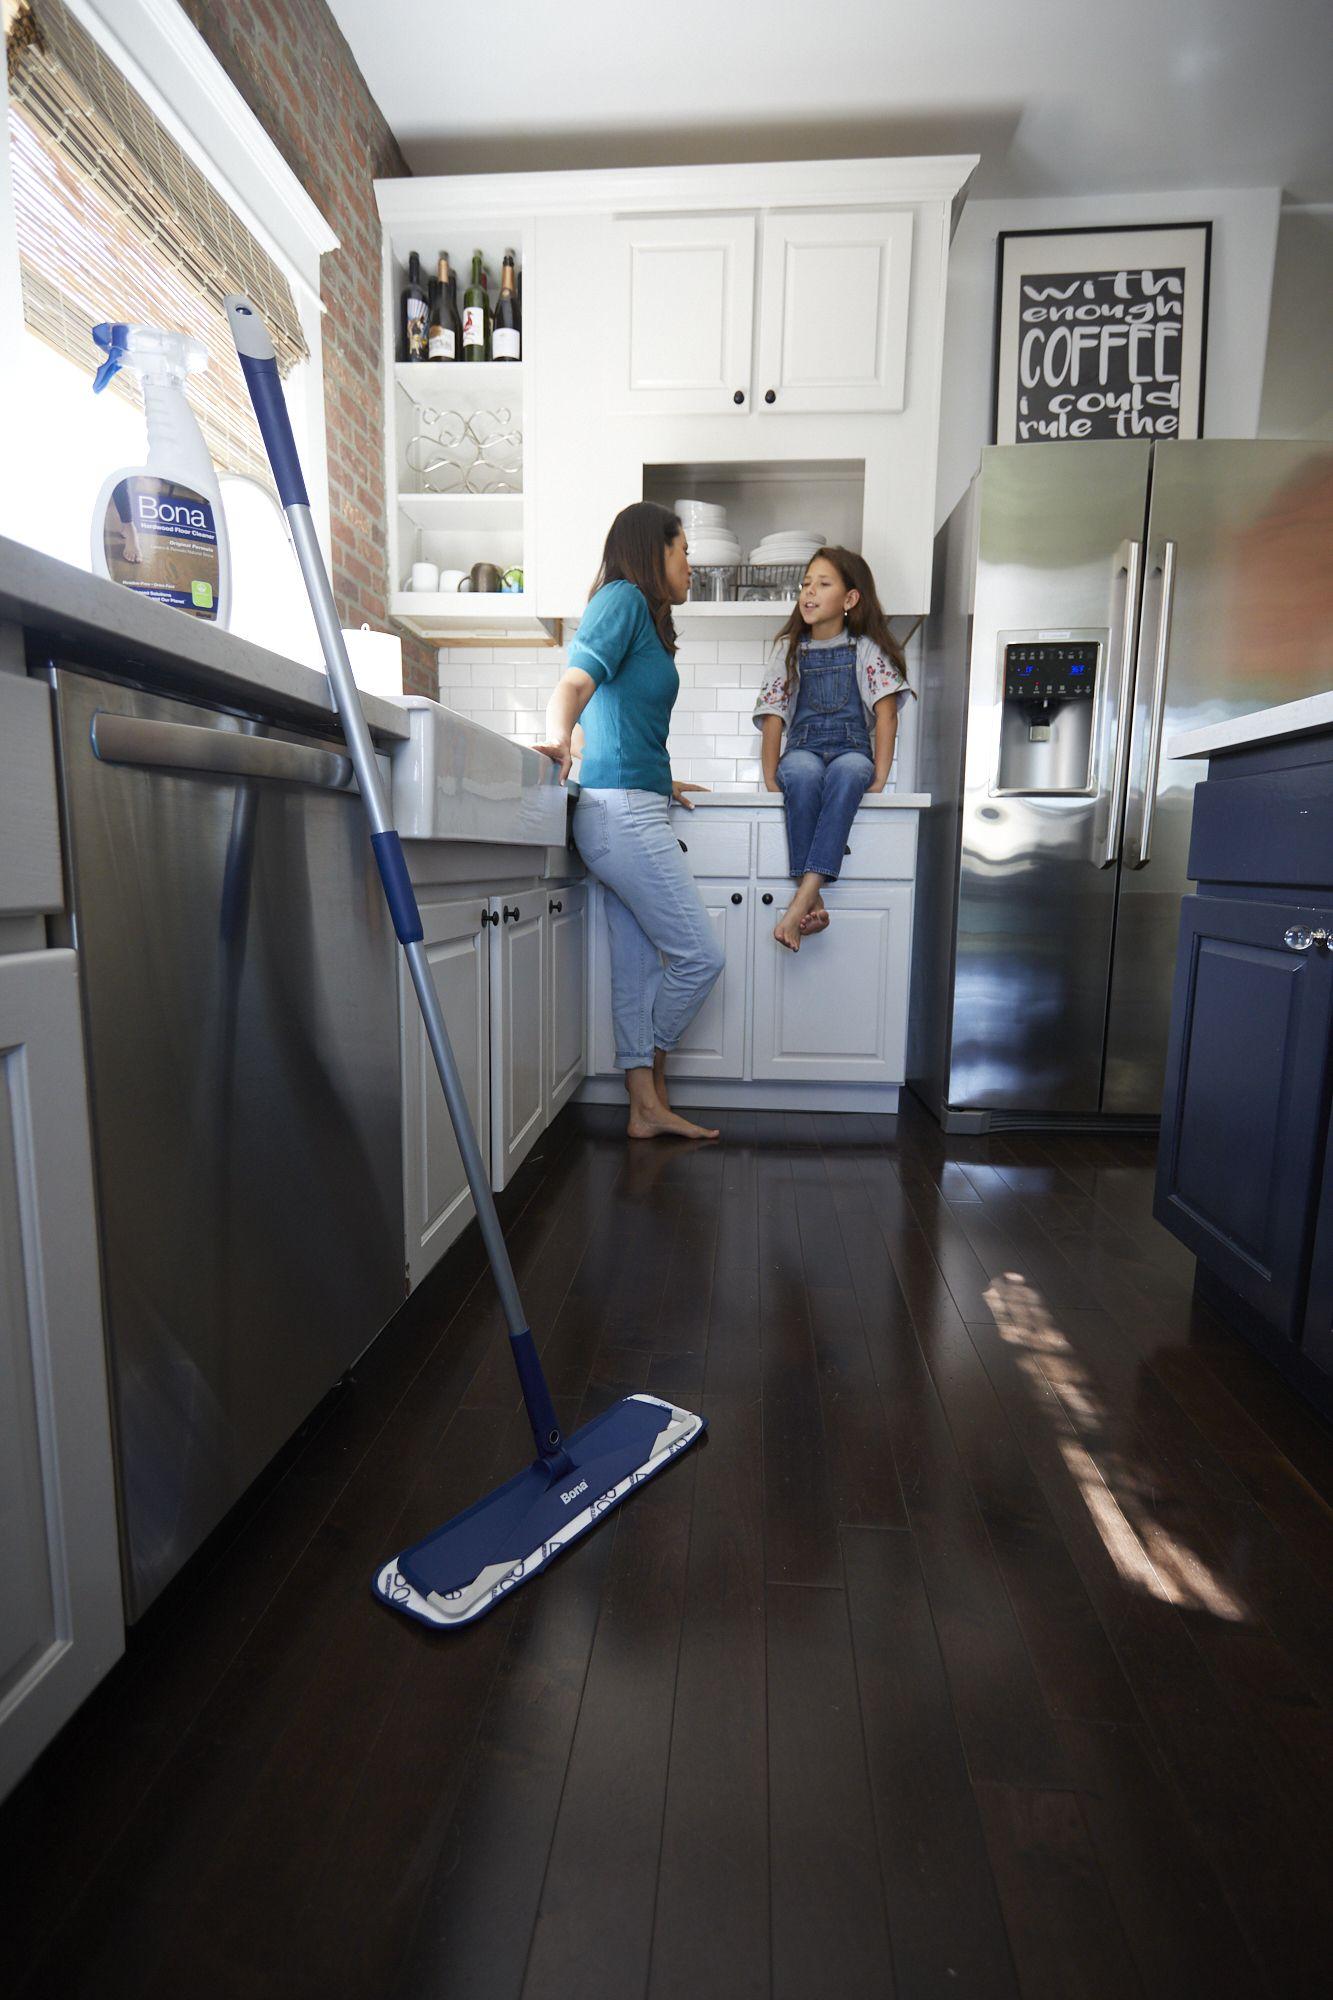 Bona Premium Microfiber Mop For Multi Surface Floors Flooring Microfiber Mops Microfiber